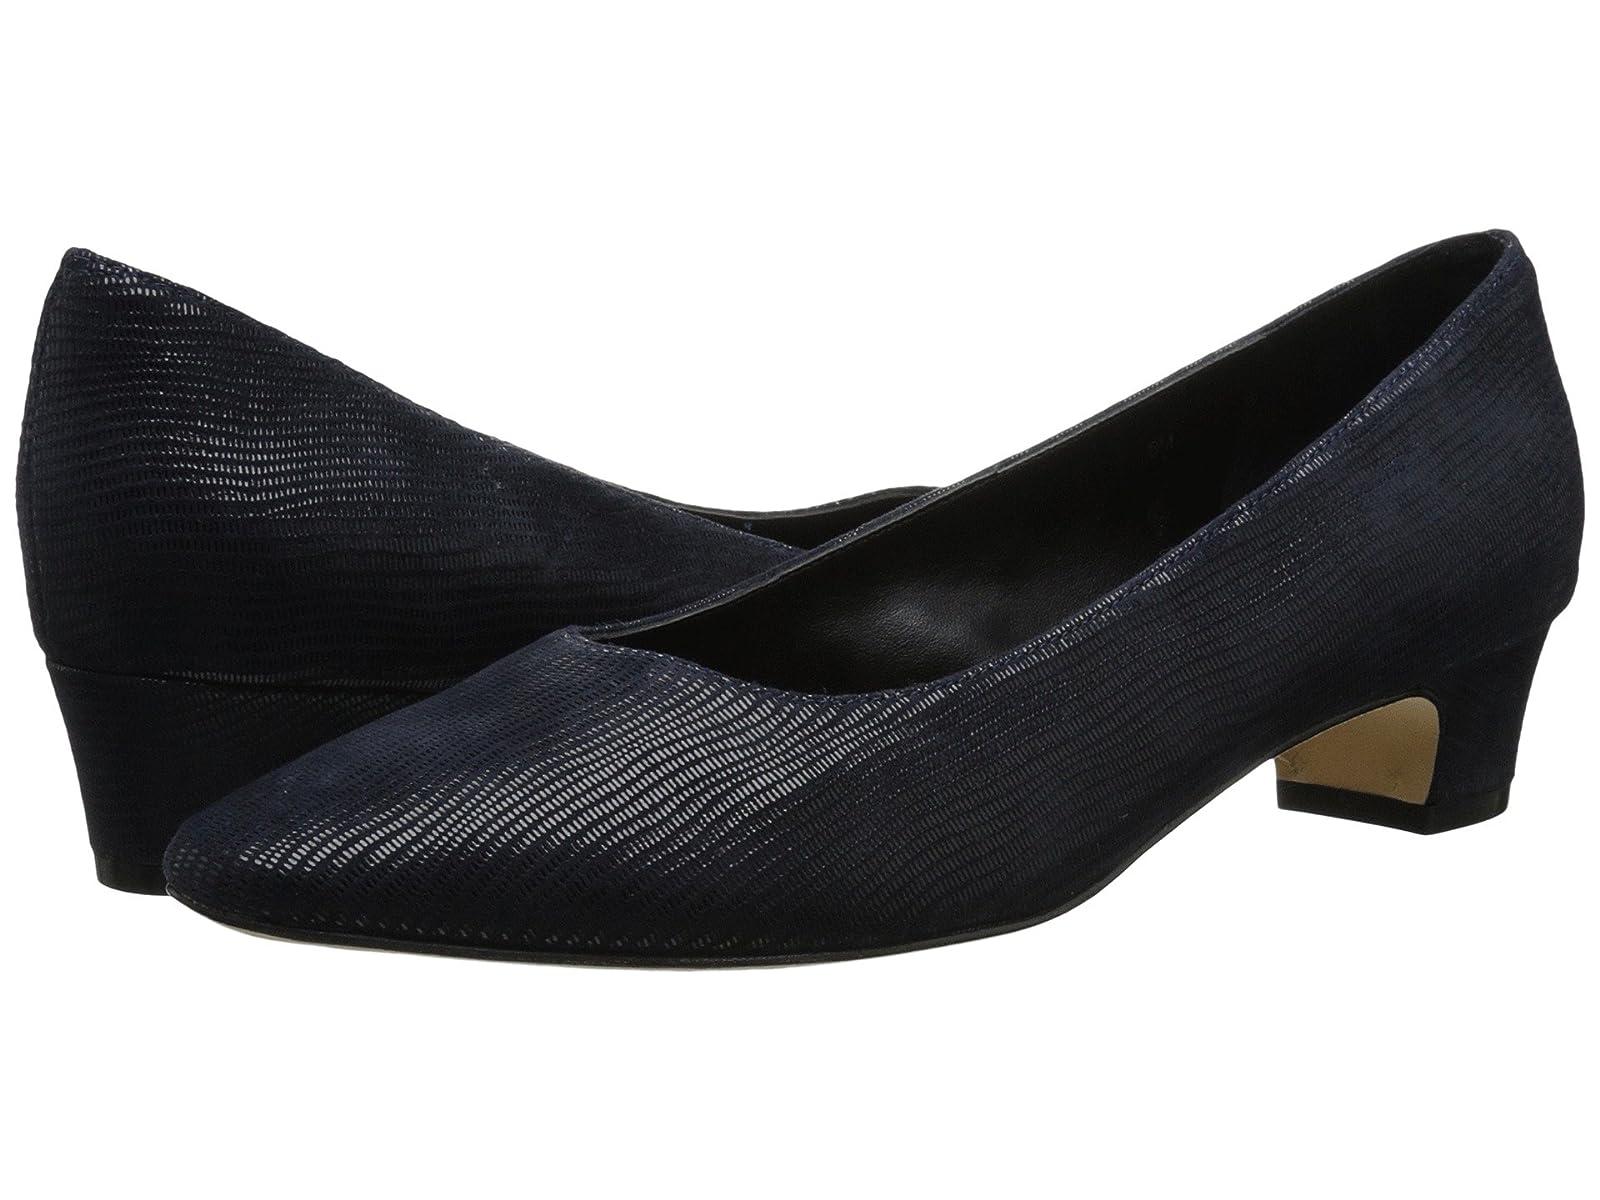 Vaneli AstyrAtmospheric grades have affordable shoes